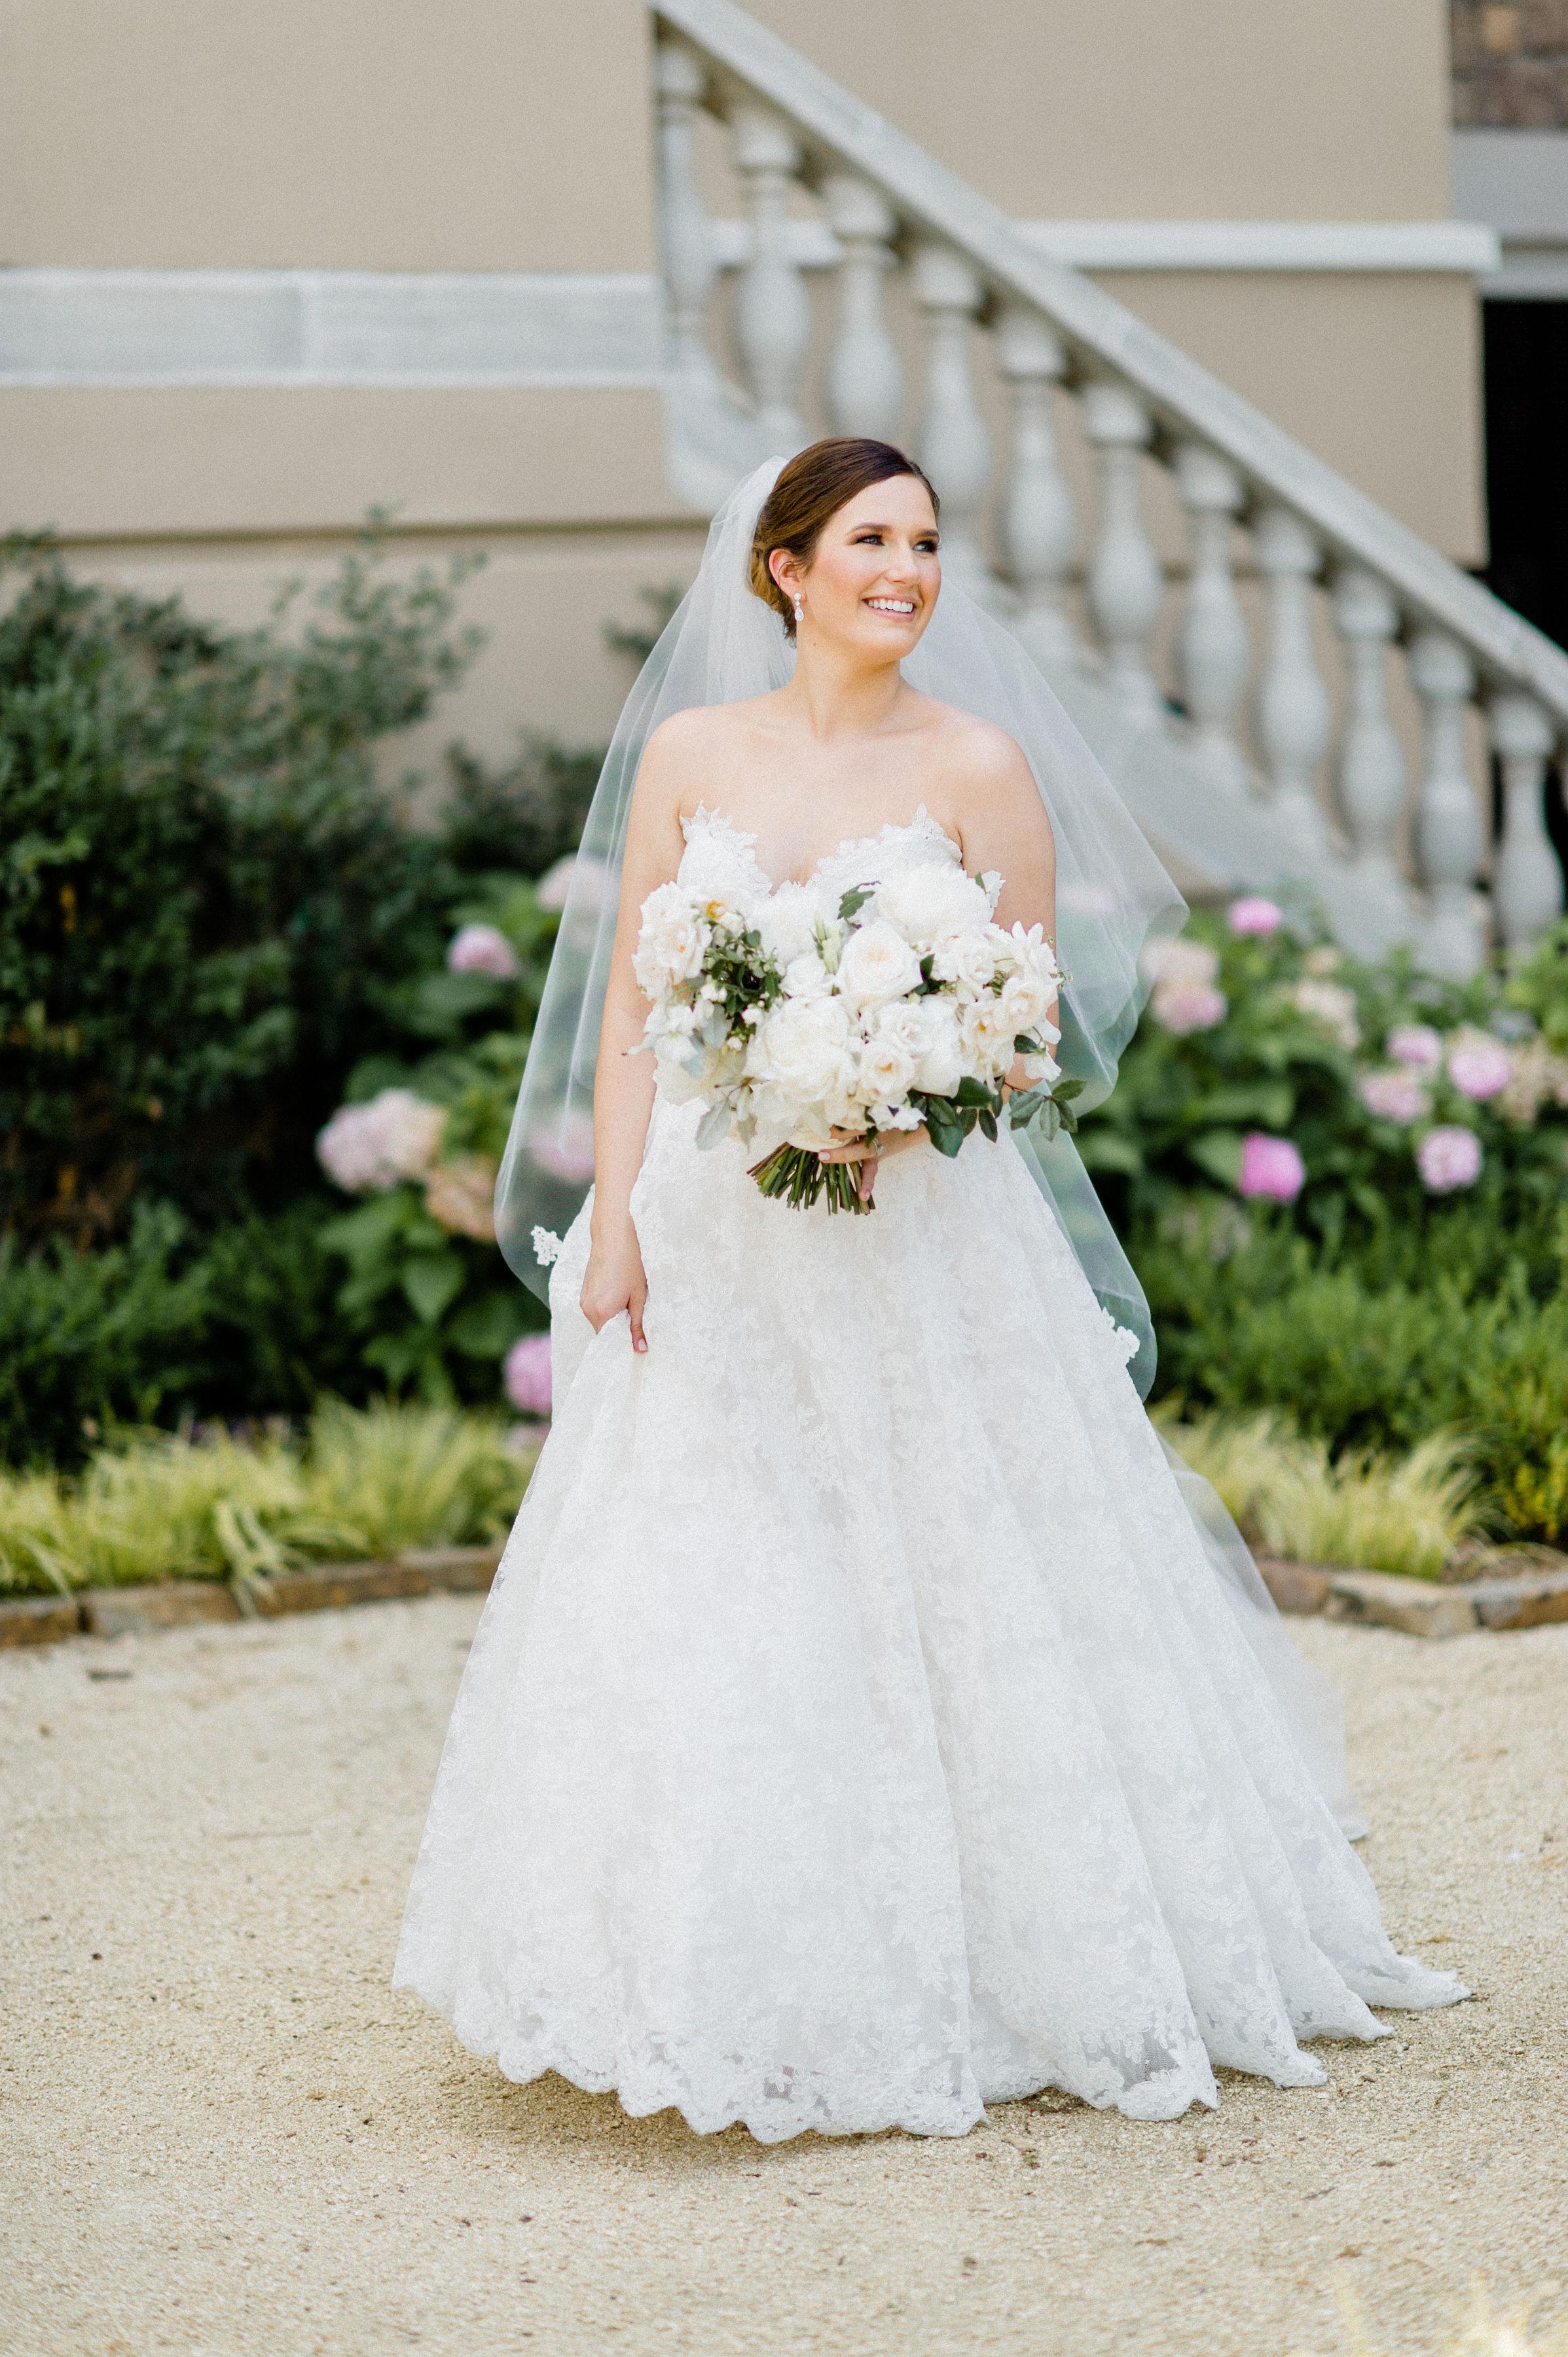 McElravey_Wedding_CarolineLimaPhotography_2018_225.jpg